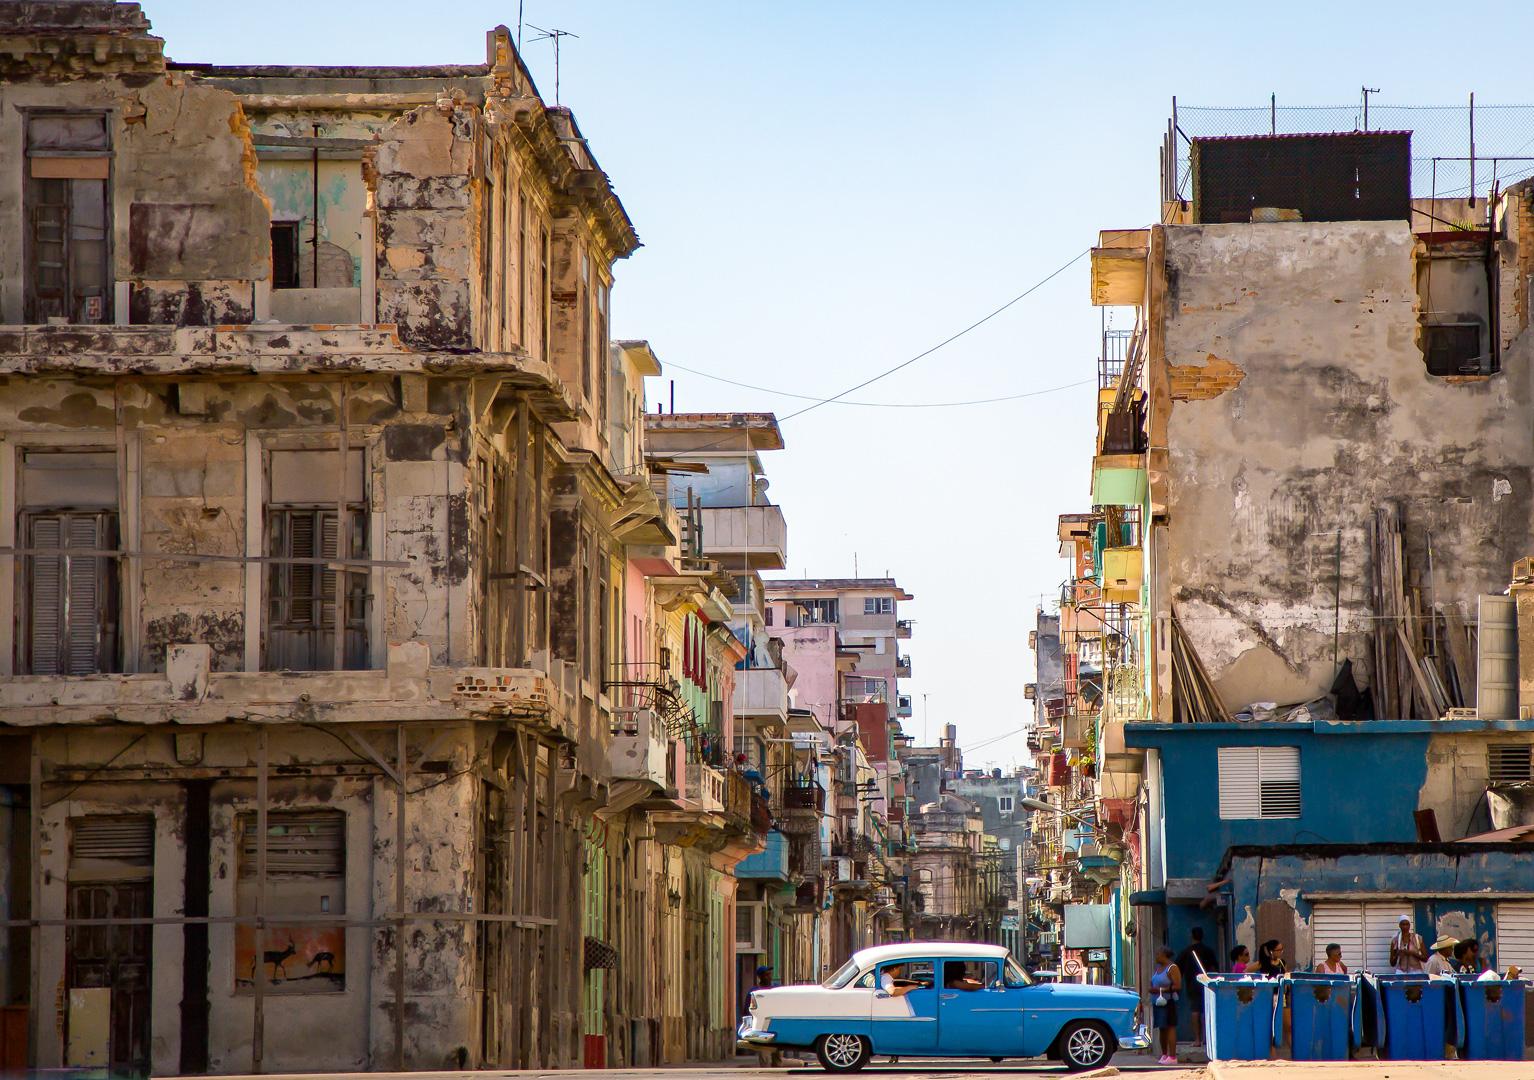 4257893455617216090-PD3_8700RAW_KateMikkelsen_Havana